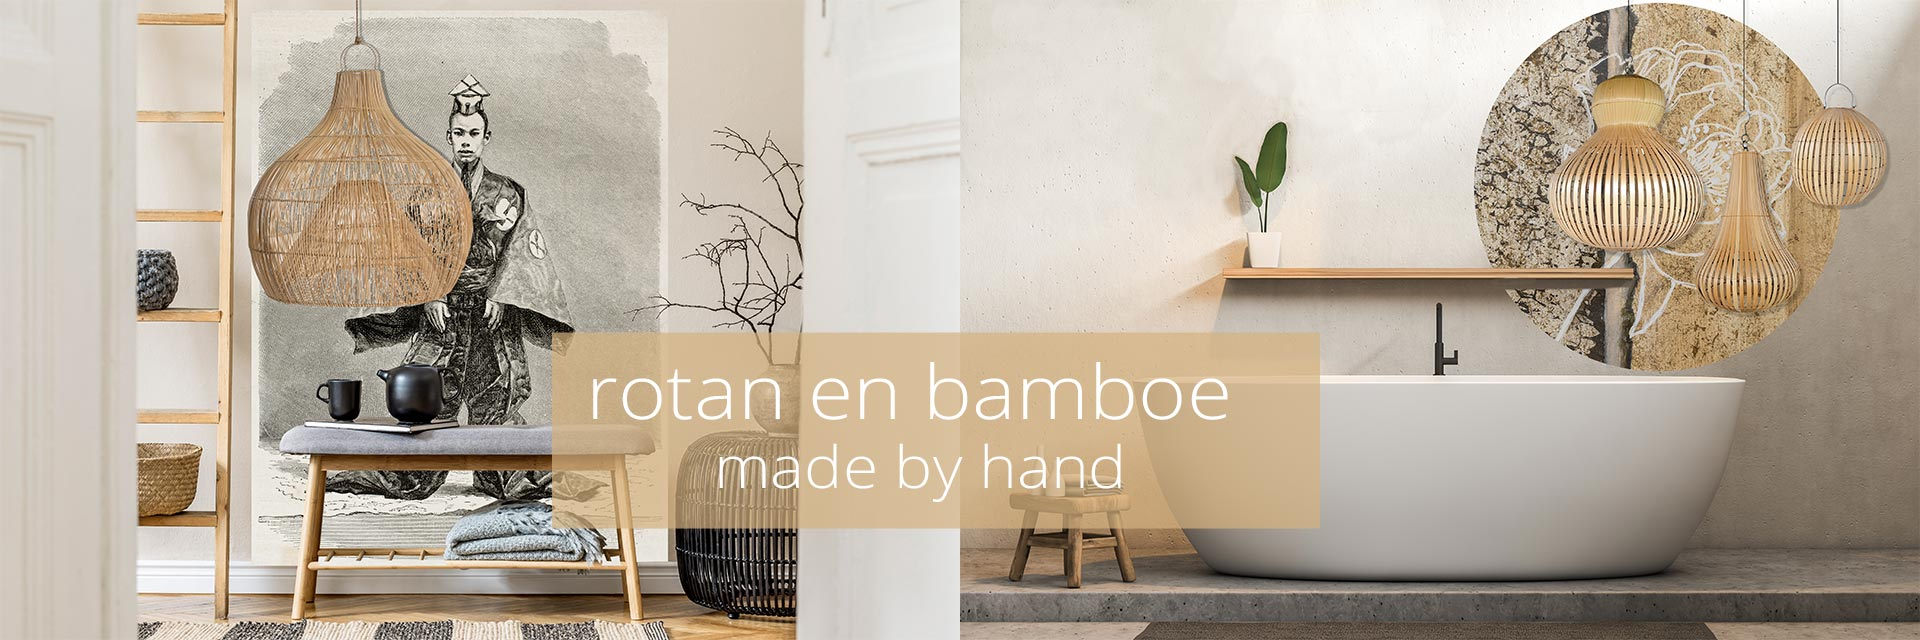 rotan en bamboe